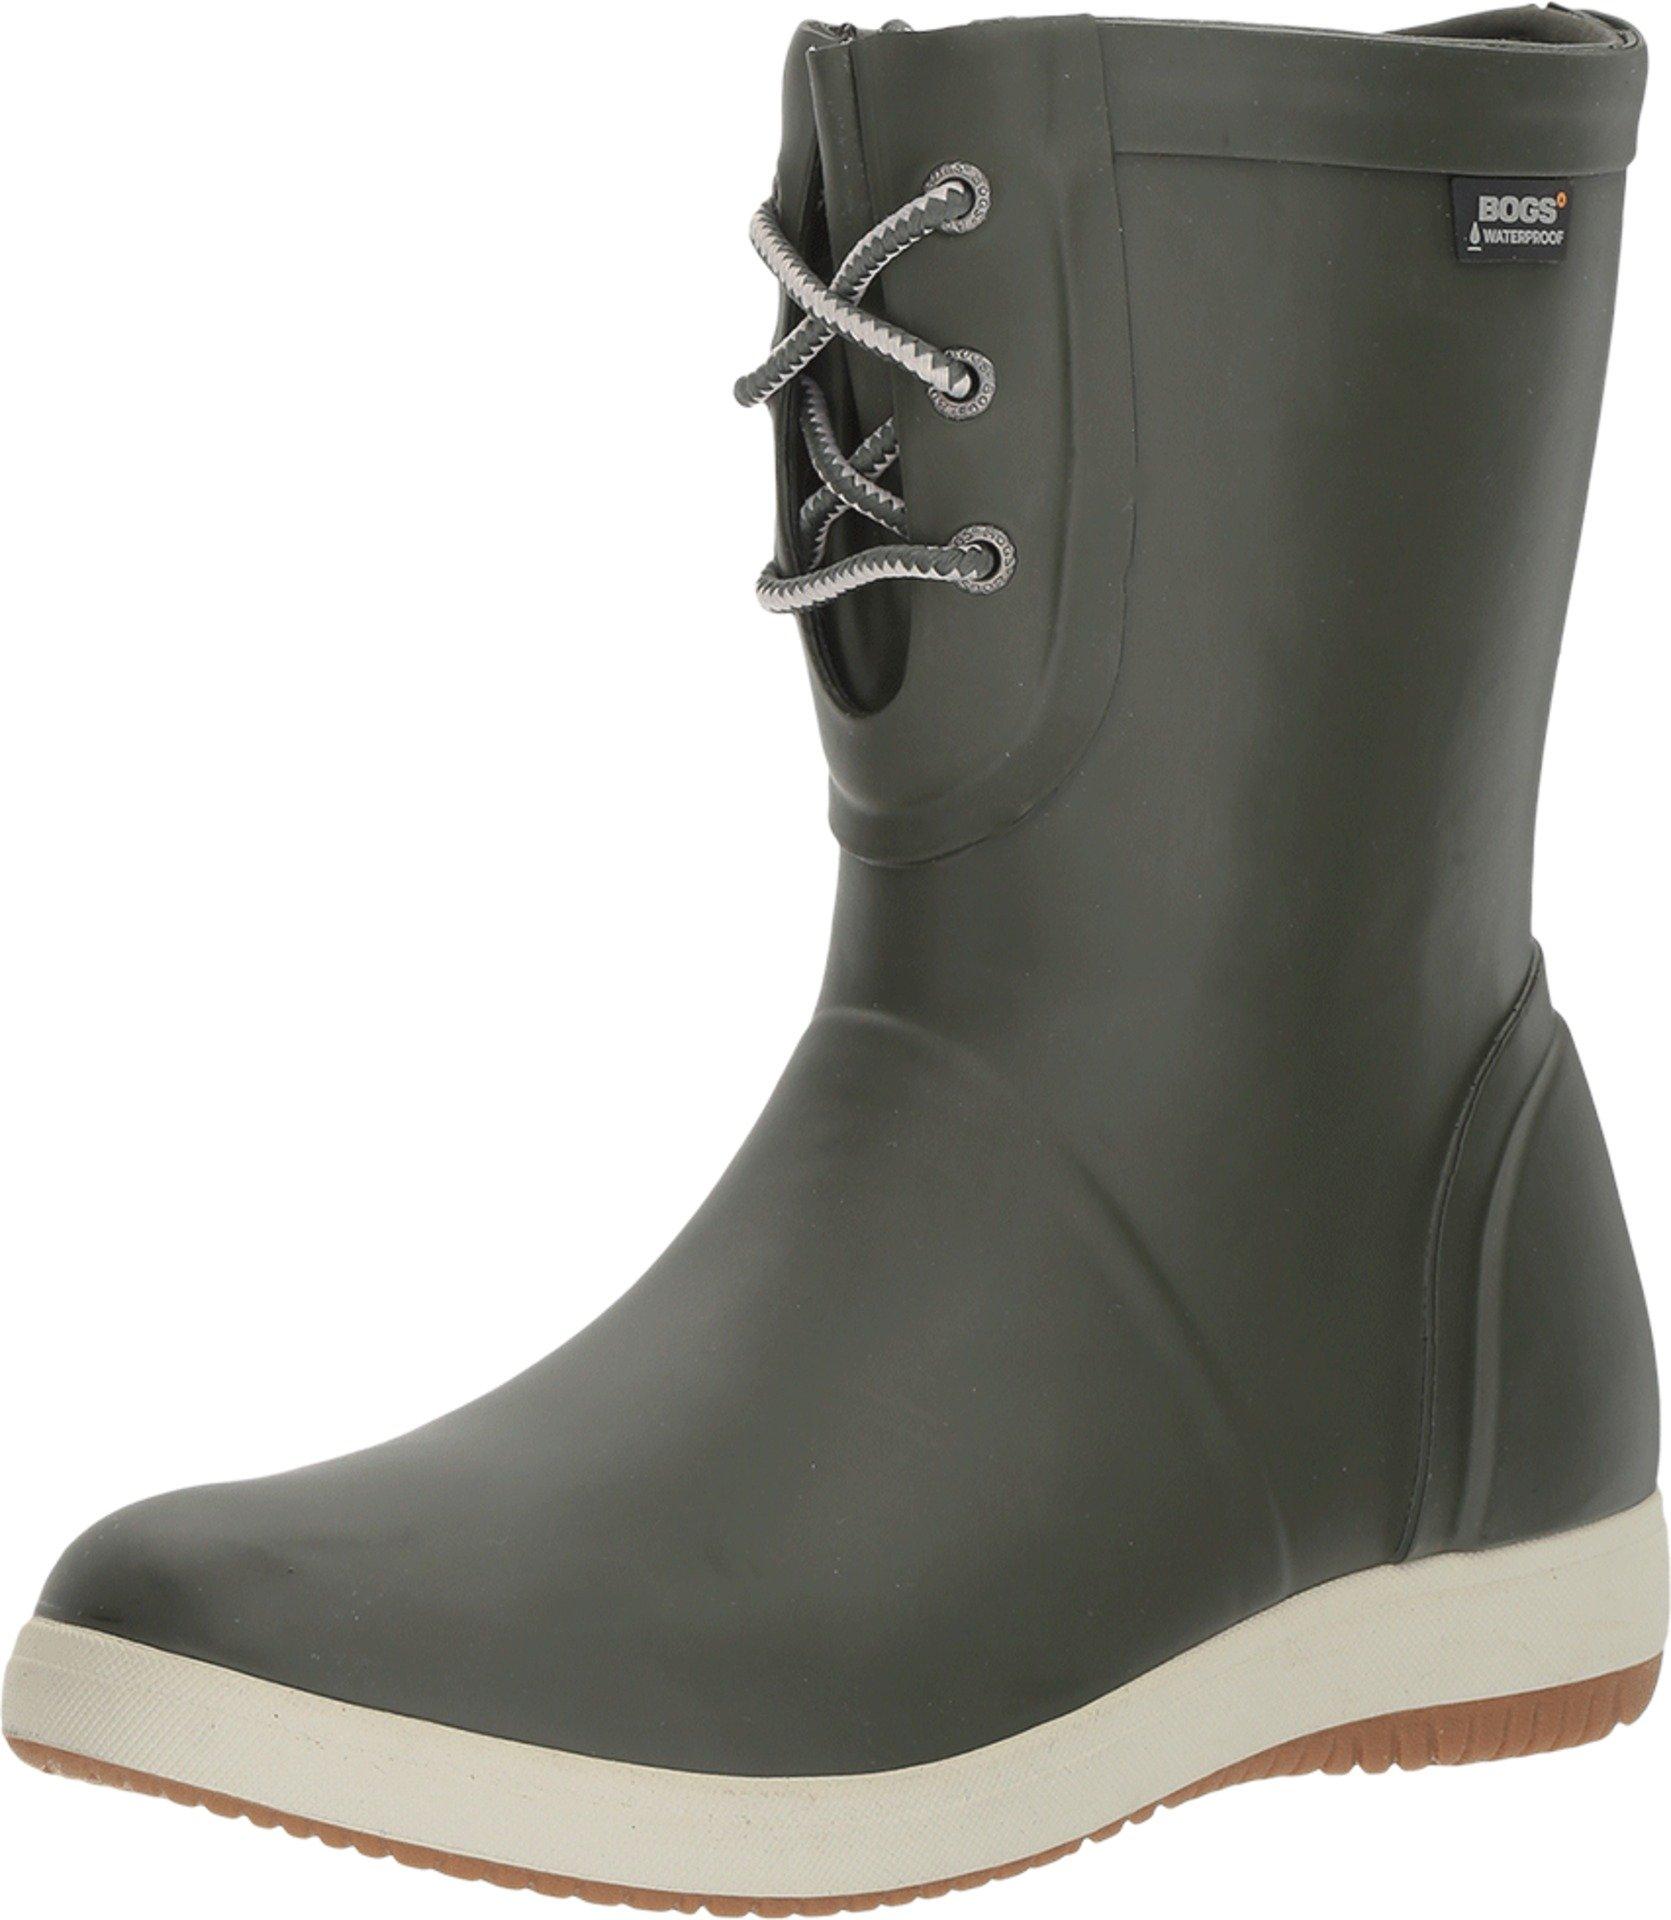 Bogs Women's Quinn Lace Up Rain Boot,Loden,US 11 M